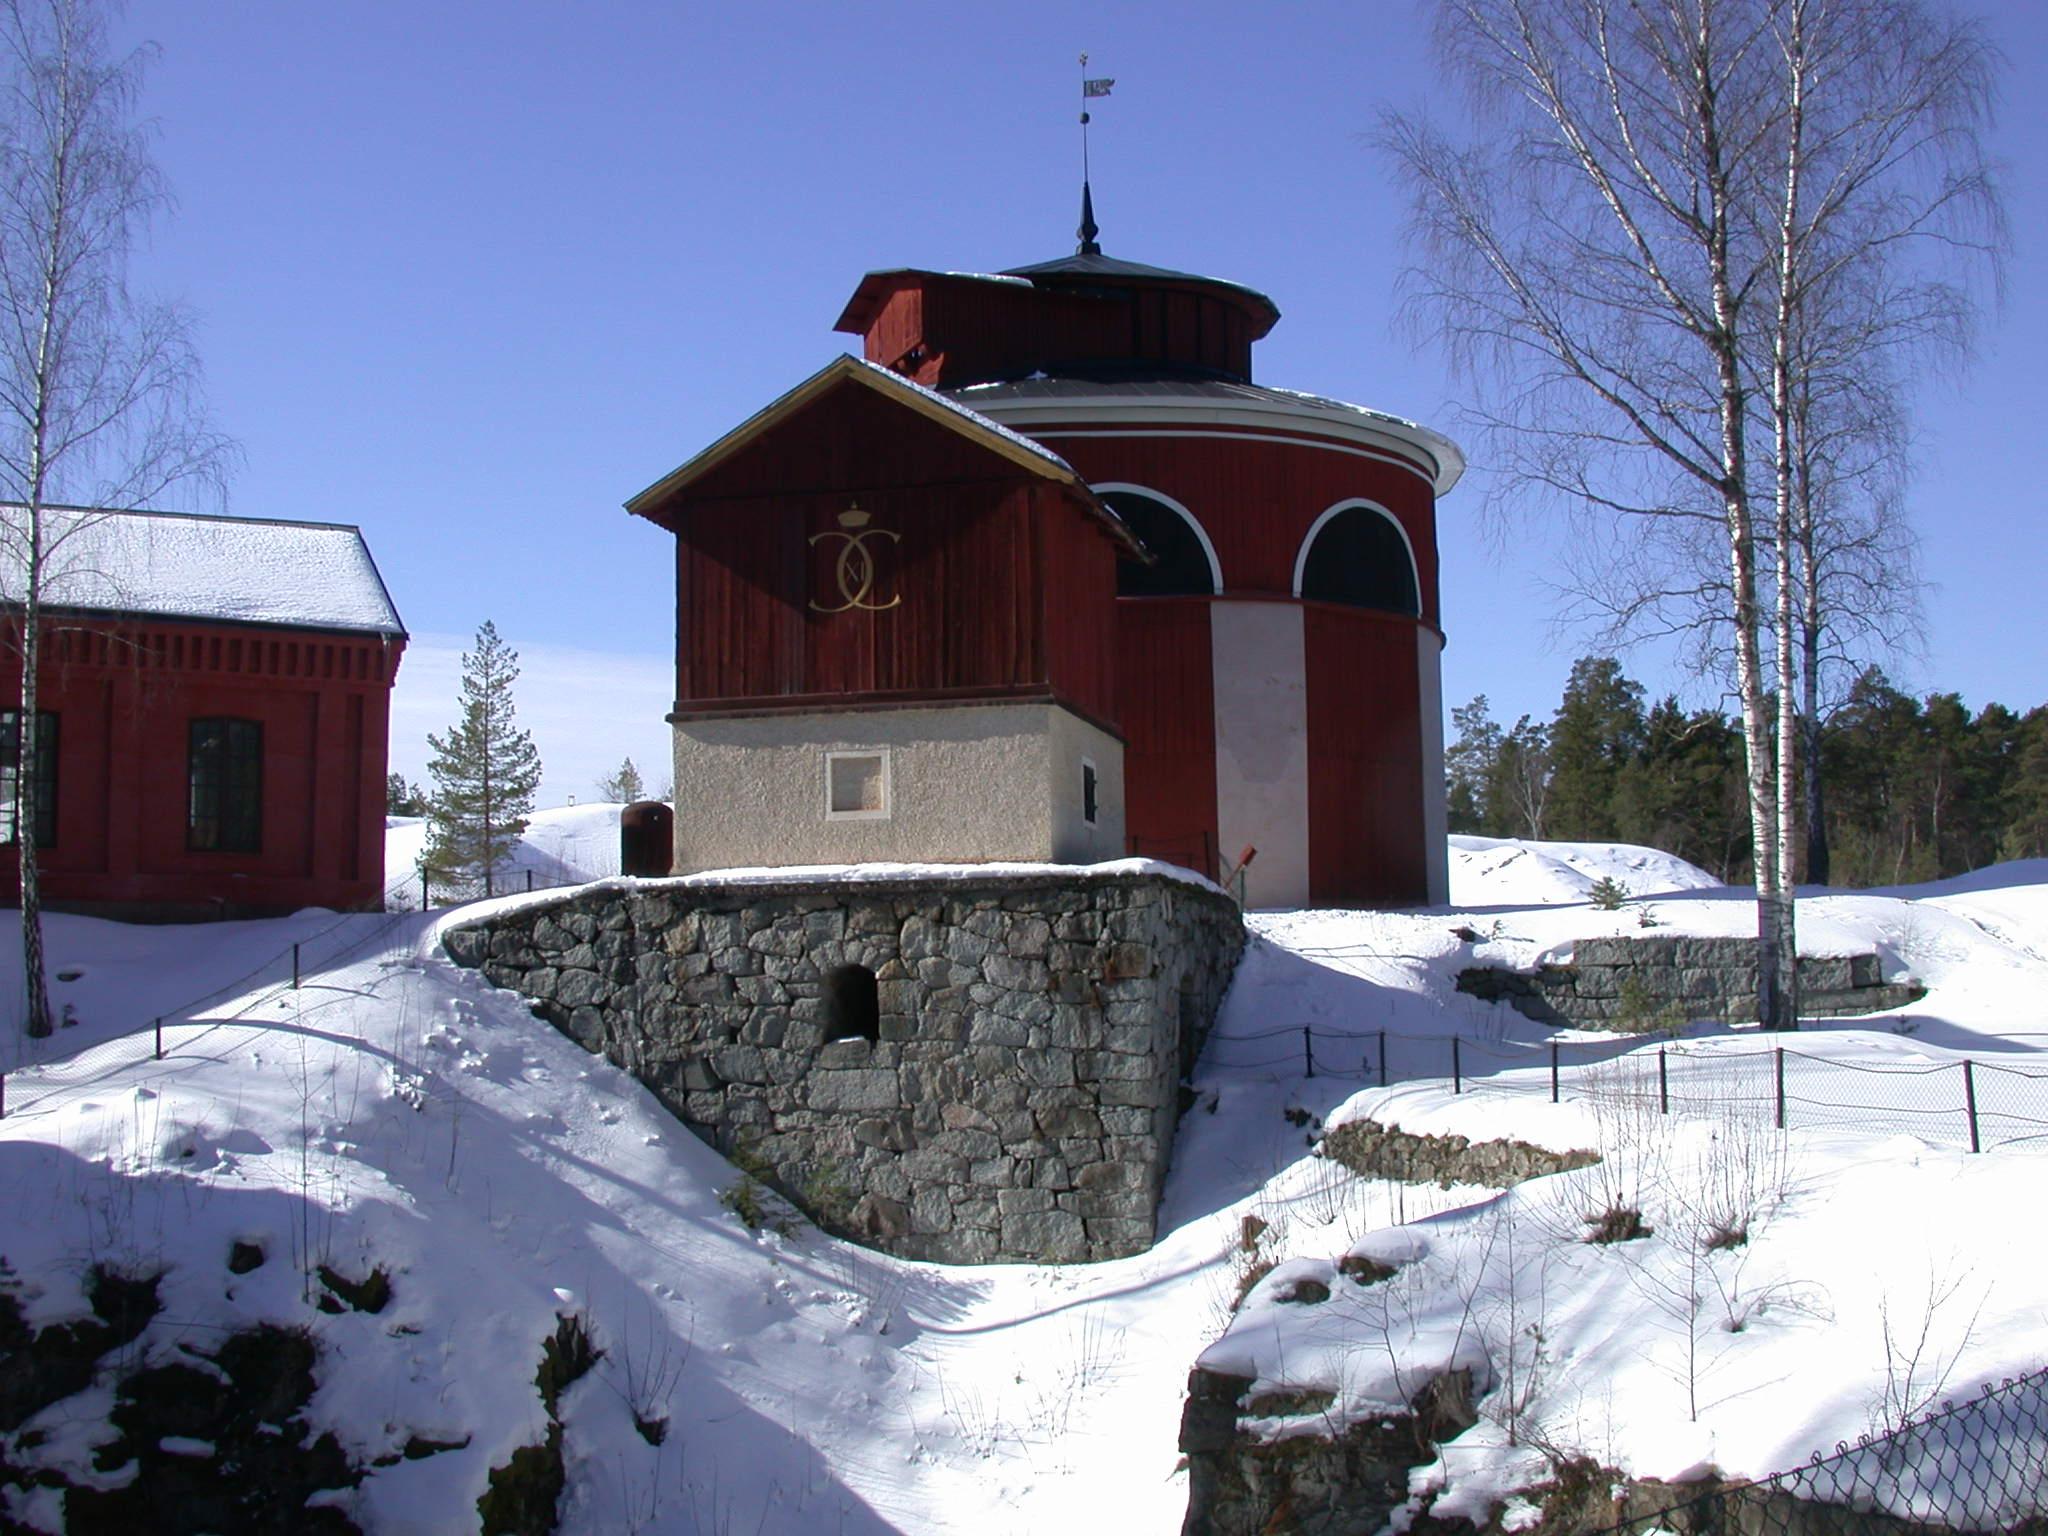 15_Carl_IX_shaft,_Sala_Silver_mine,_Sala,_Sweden